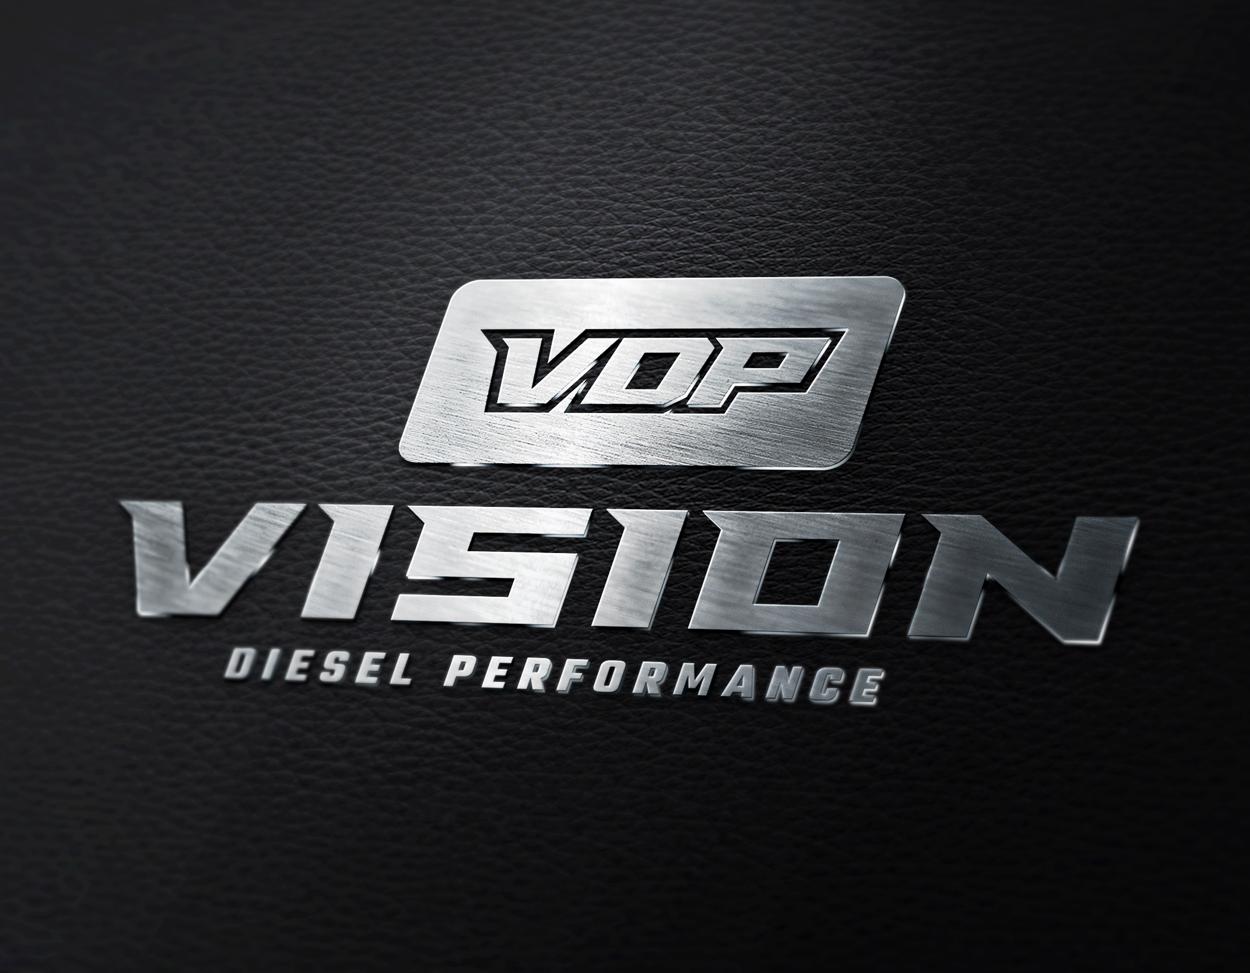 Vision Diesel Performance Truck Logo Design